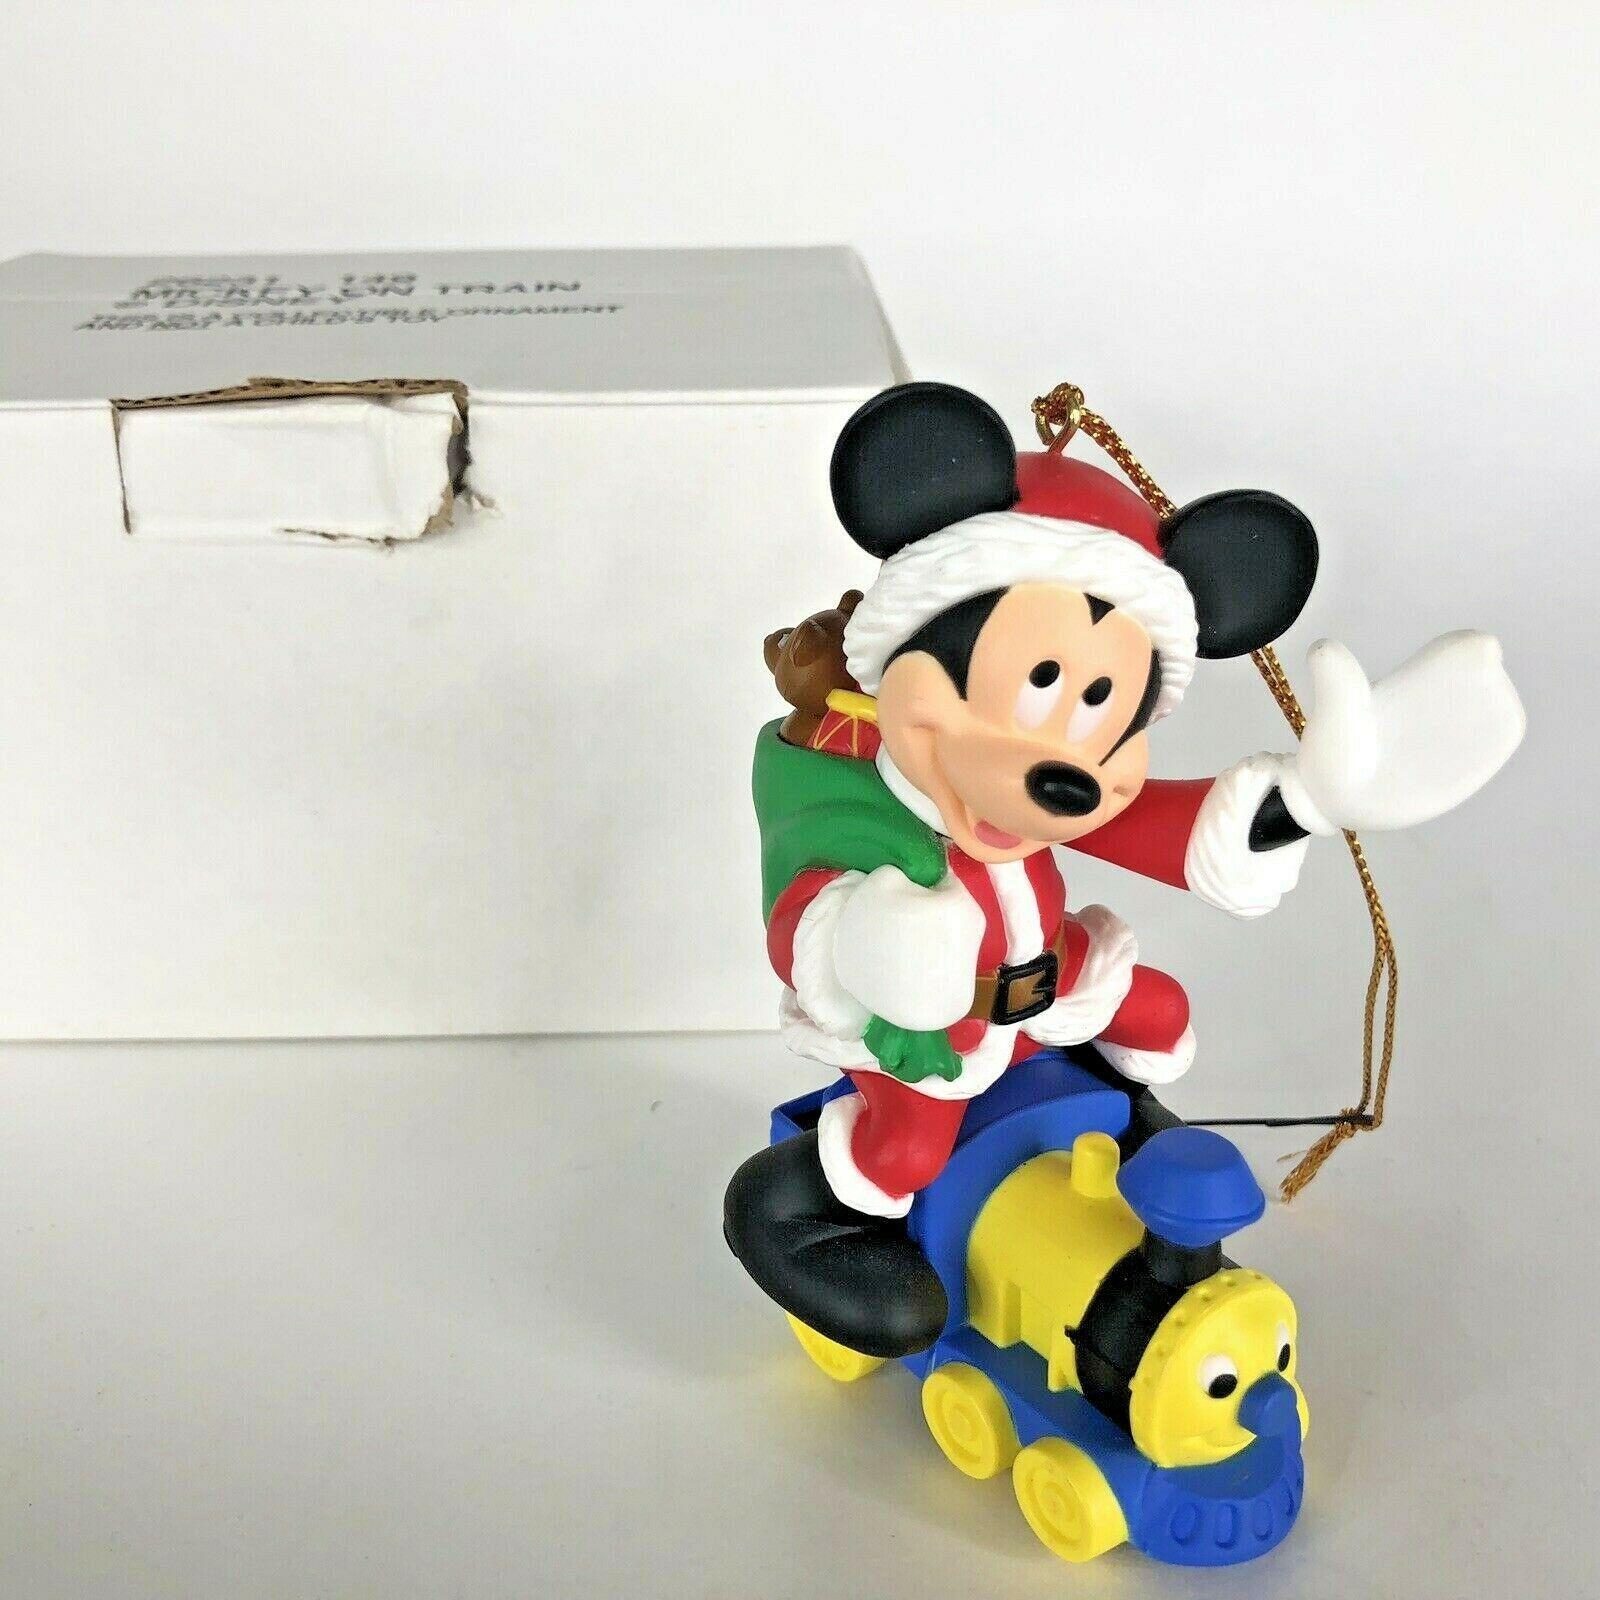 Disney Grolier Mickey Mouse On Train Christmas Magic Ornament Etsy Disney Christmas Ornaments Mickey Mouse Ornaments Christmas Magic